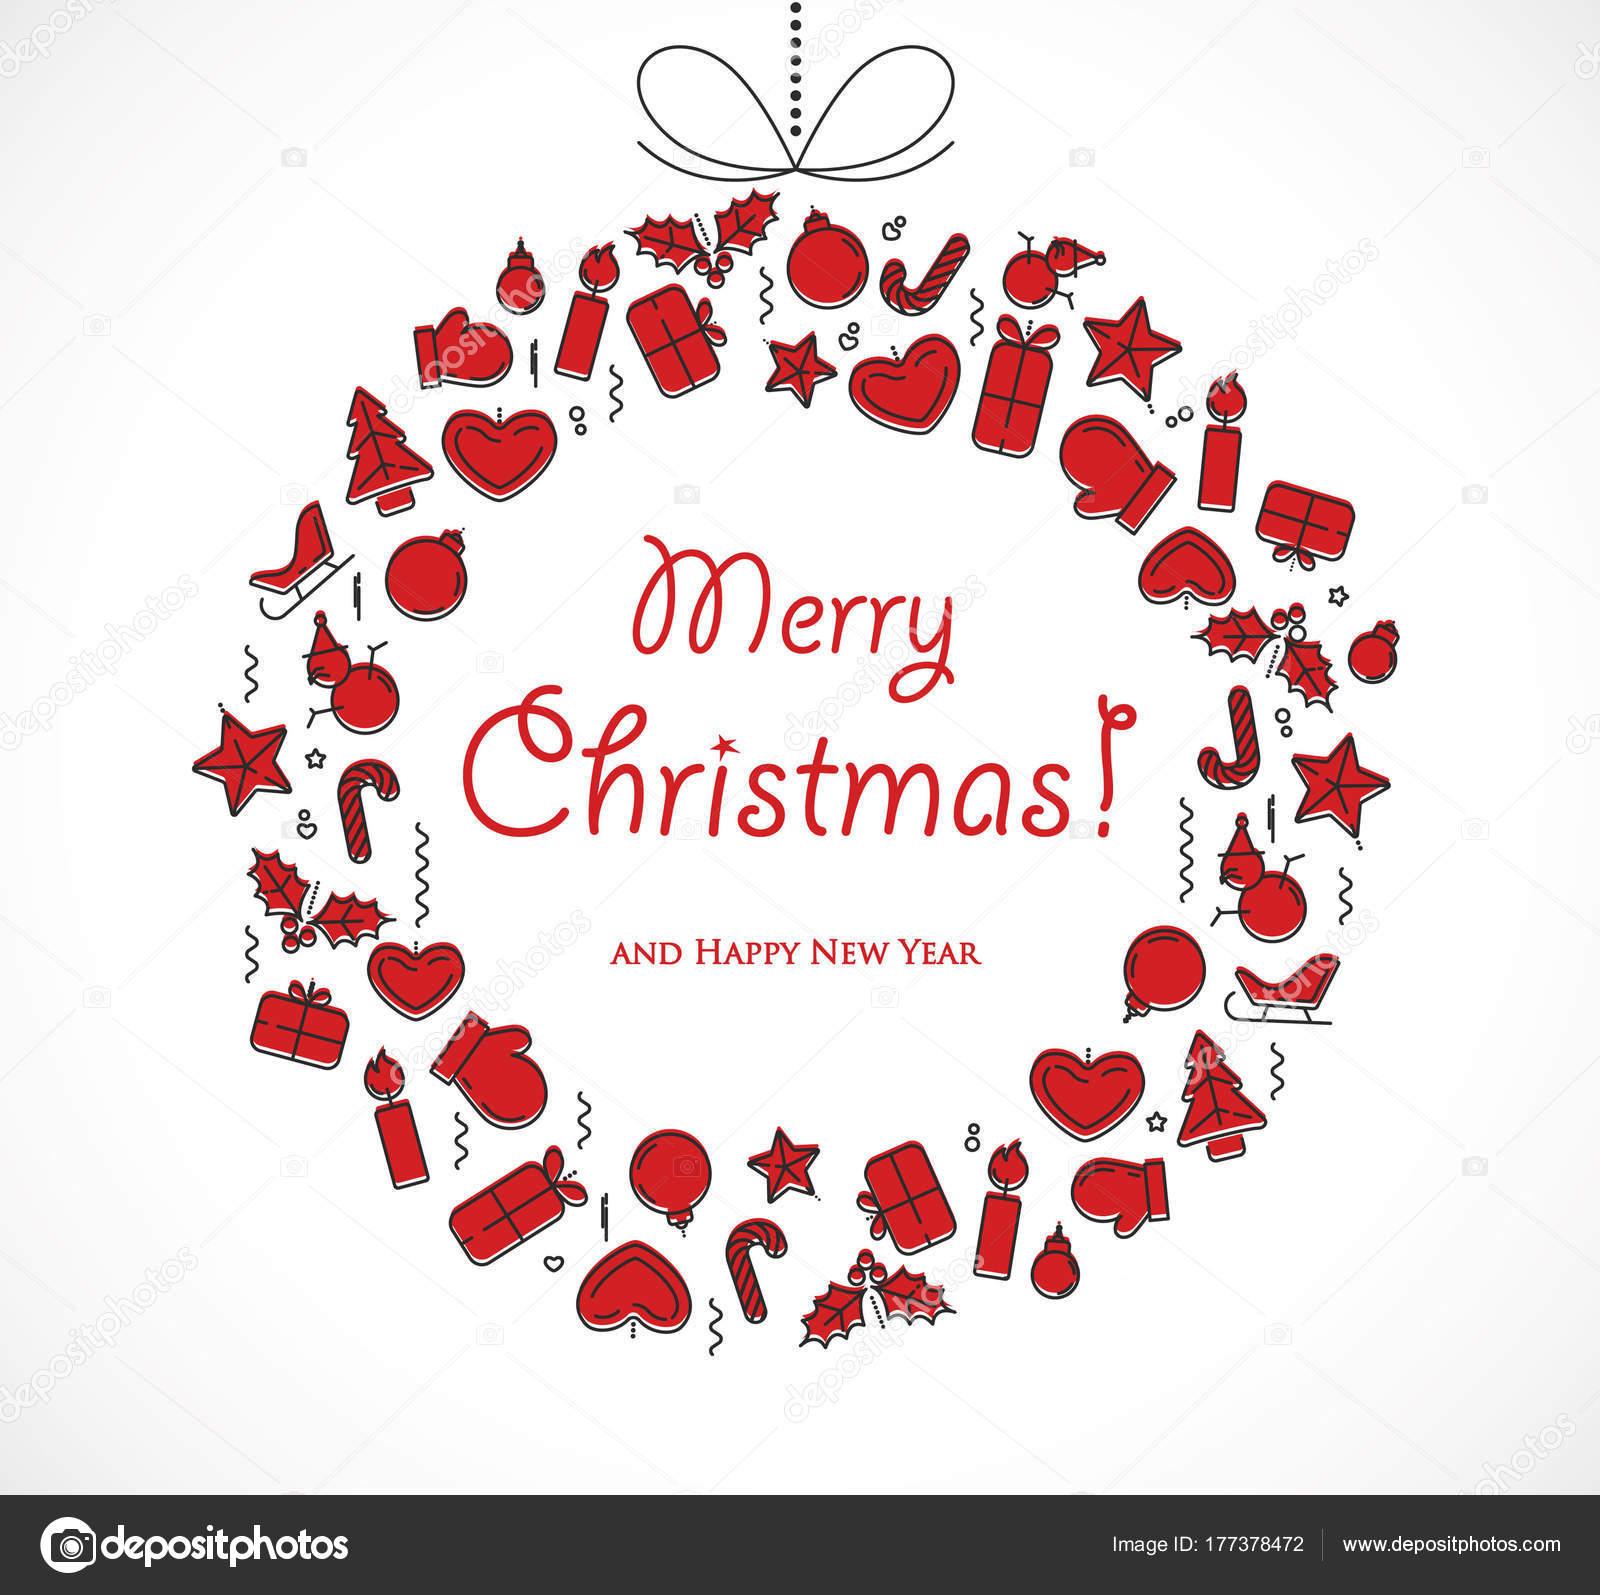 Merry christmas season greetings card stock vector pstocks merry christmas season greetings card stock vector 177378472 kristyandbryce Choice Image